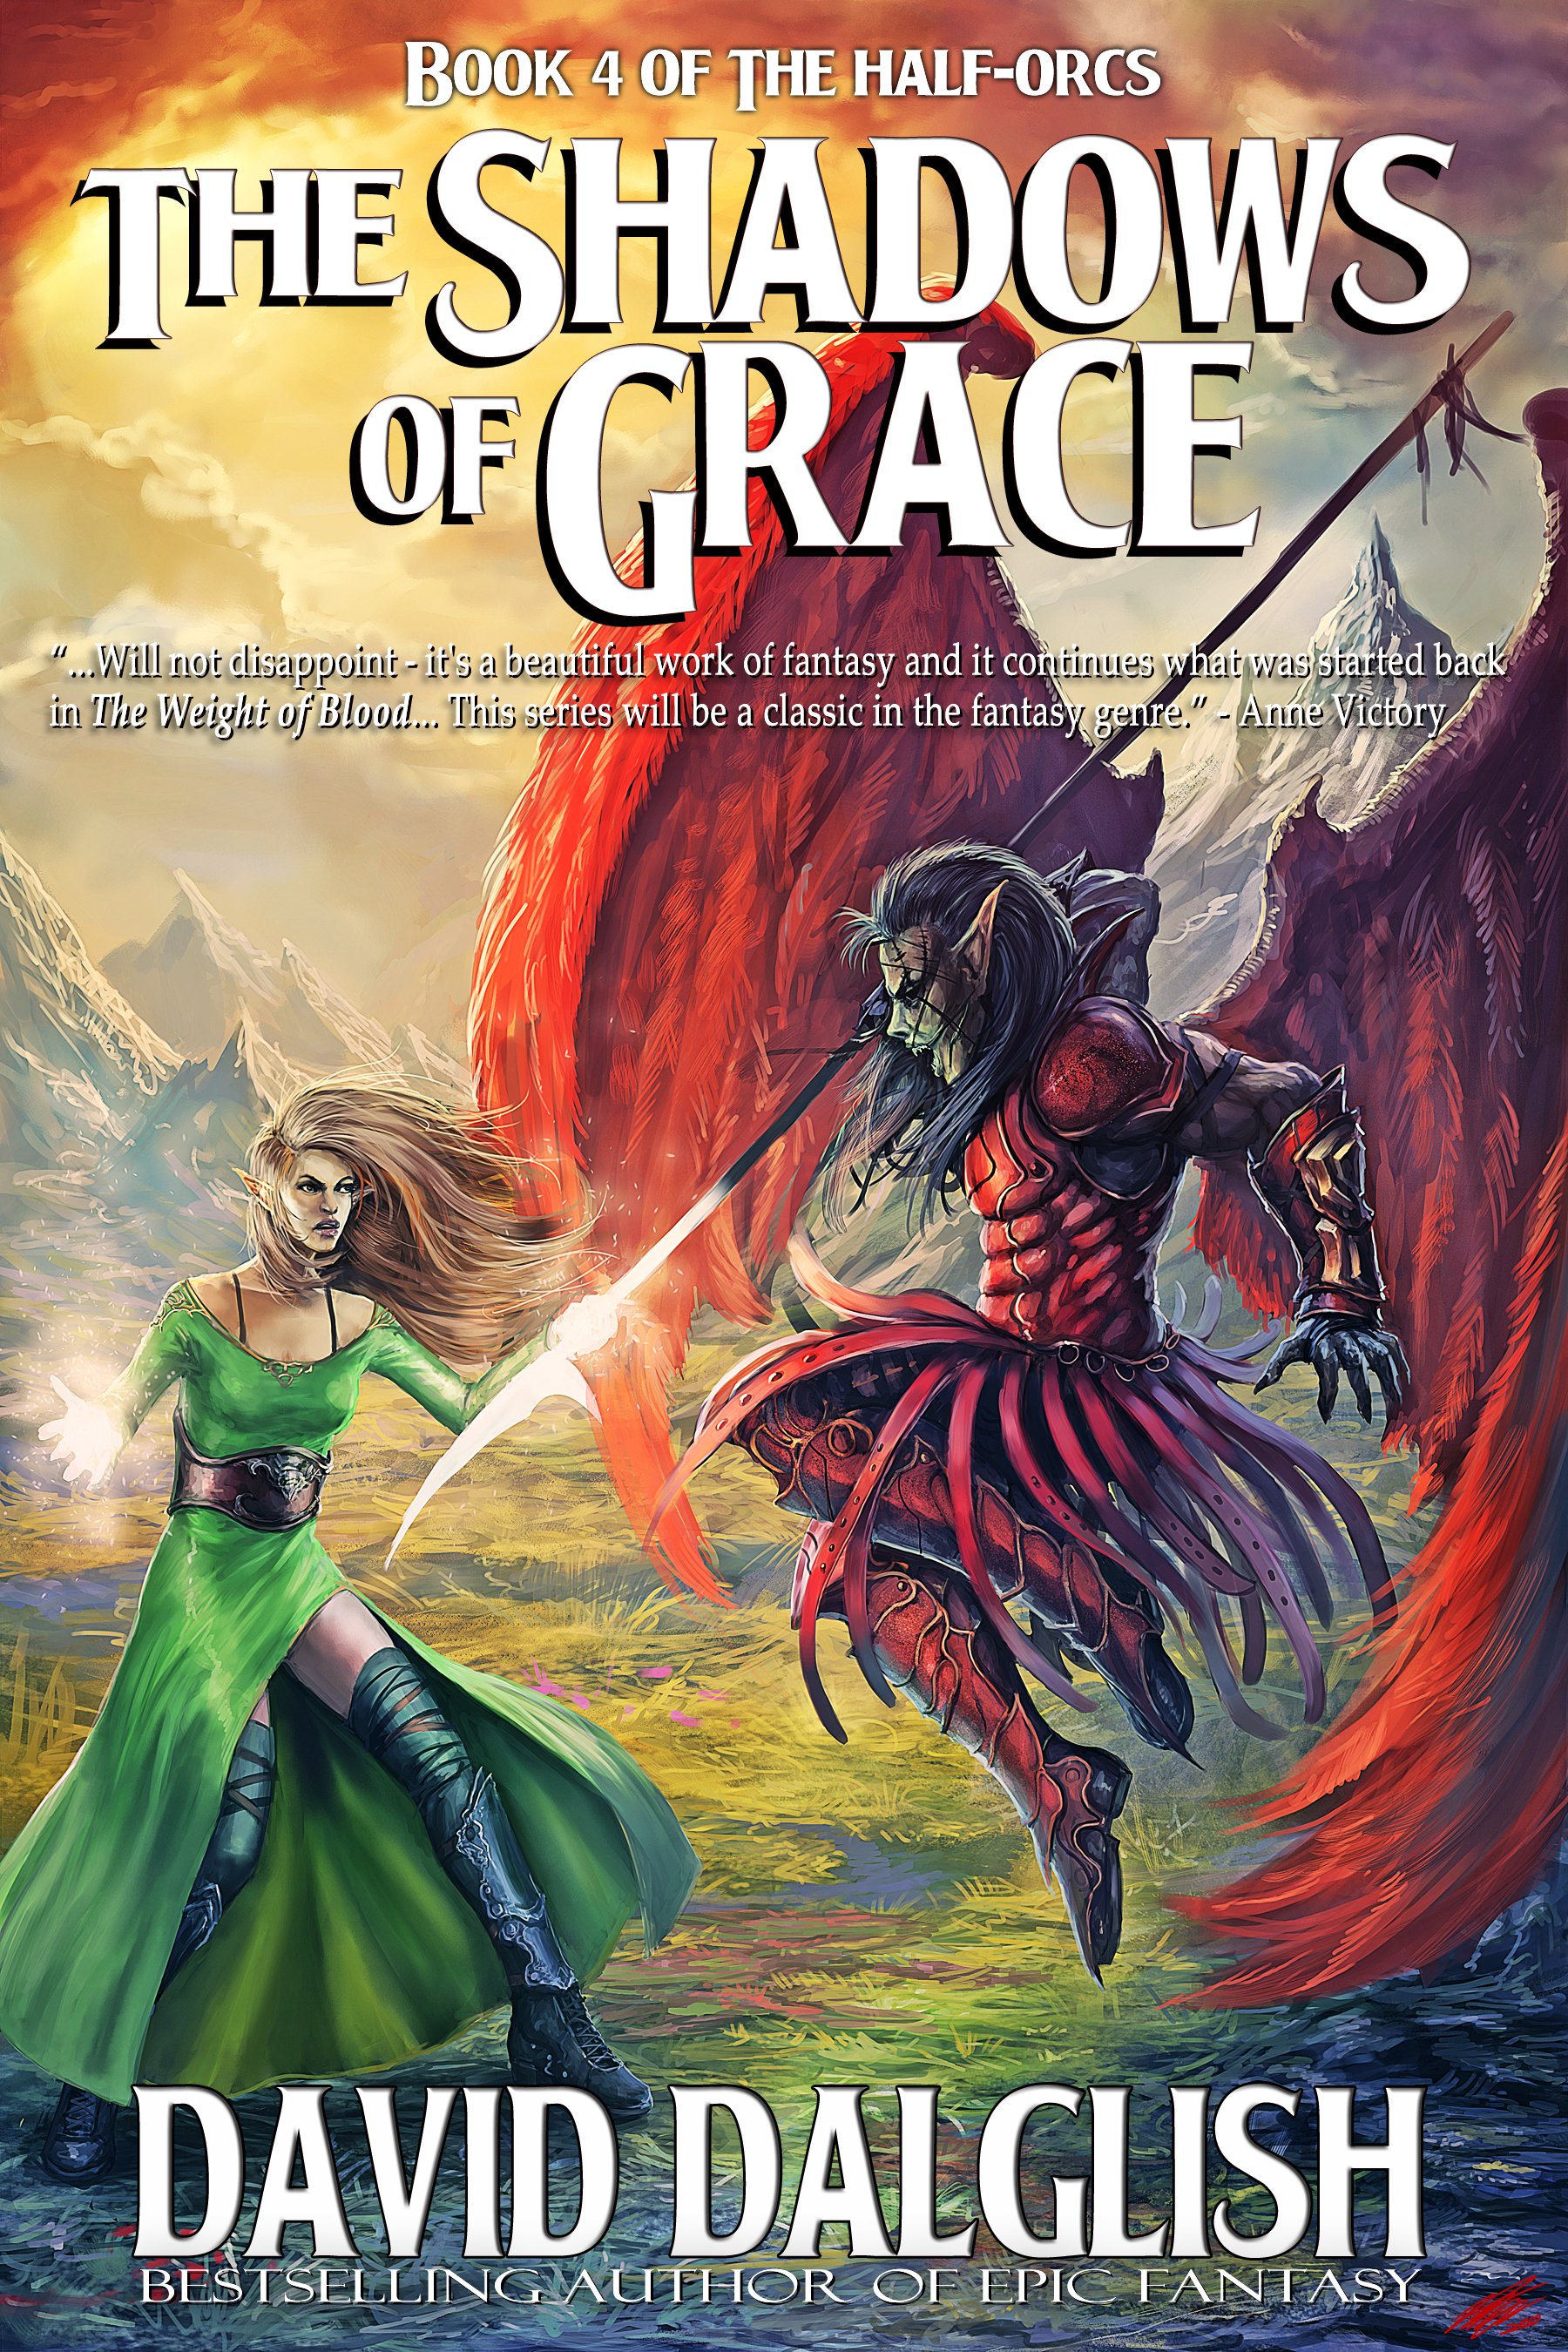 Cover, Book 4